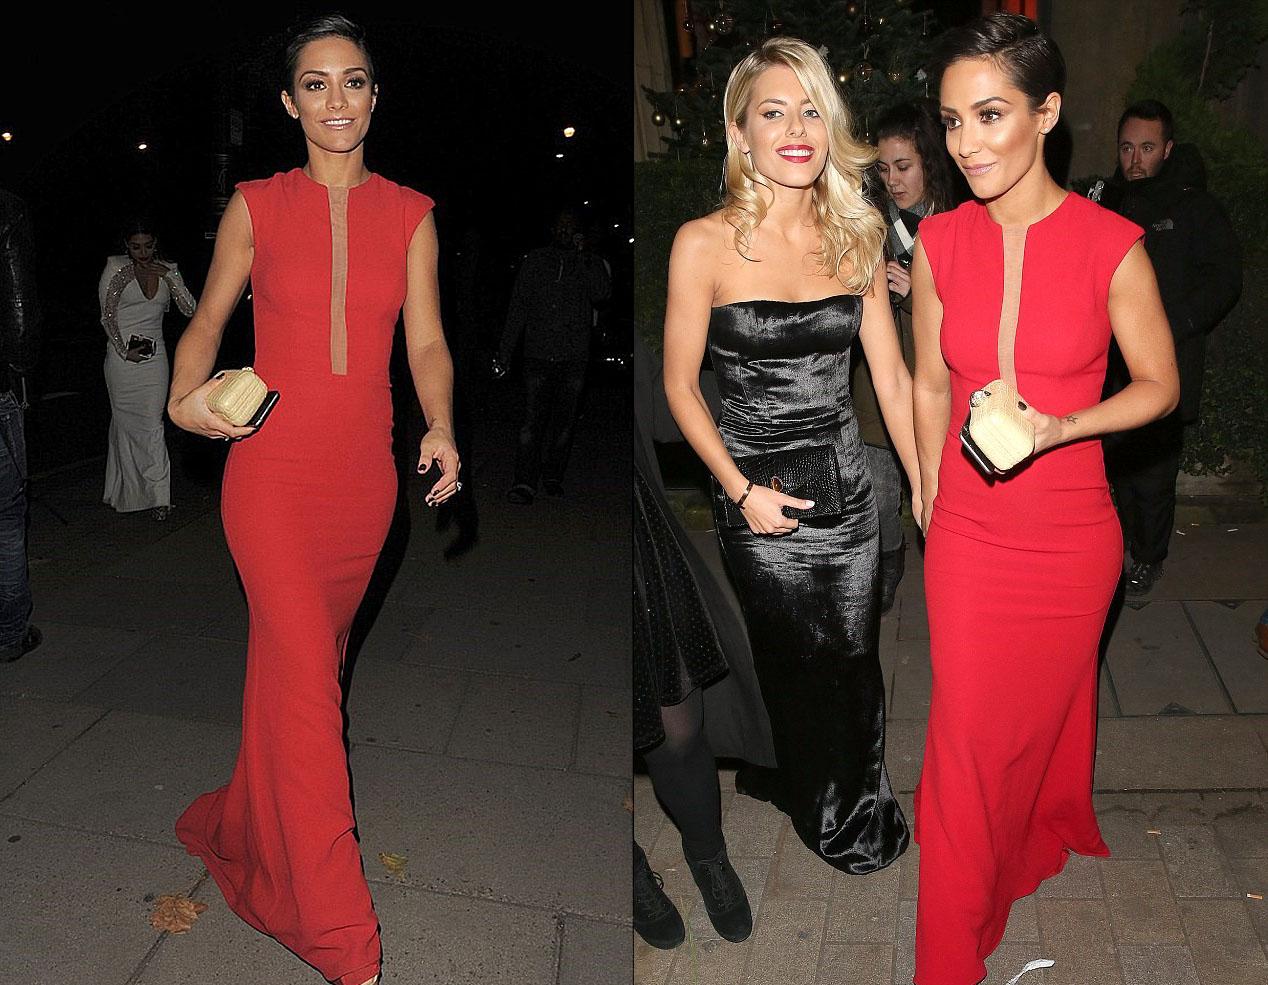 frankiesandford-thesaturdays-reddress-cosmopolitansawards2014-designerSuzanneNeville1